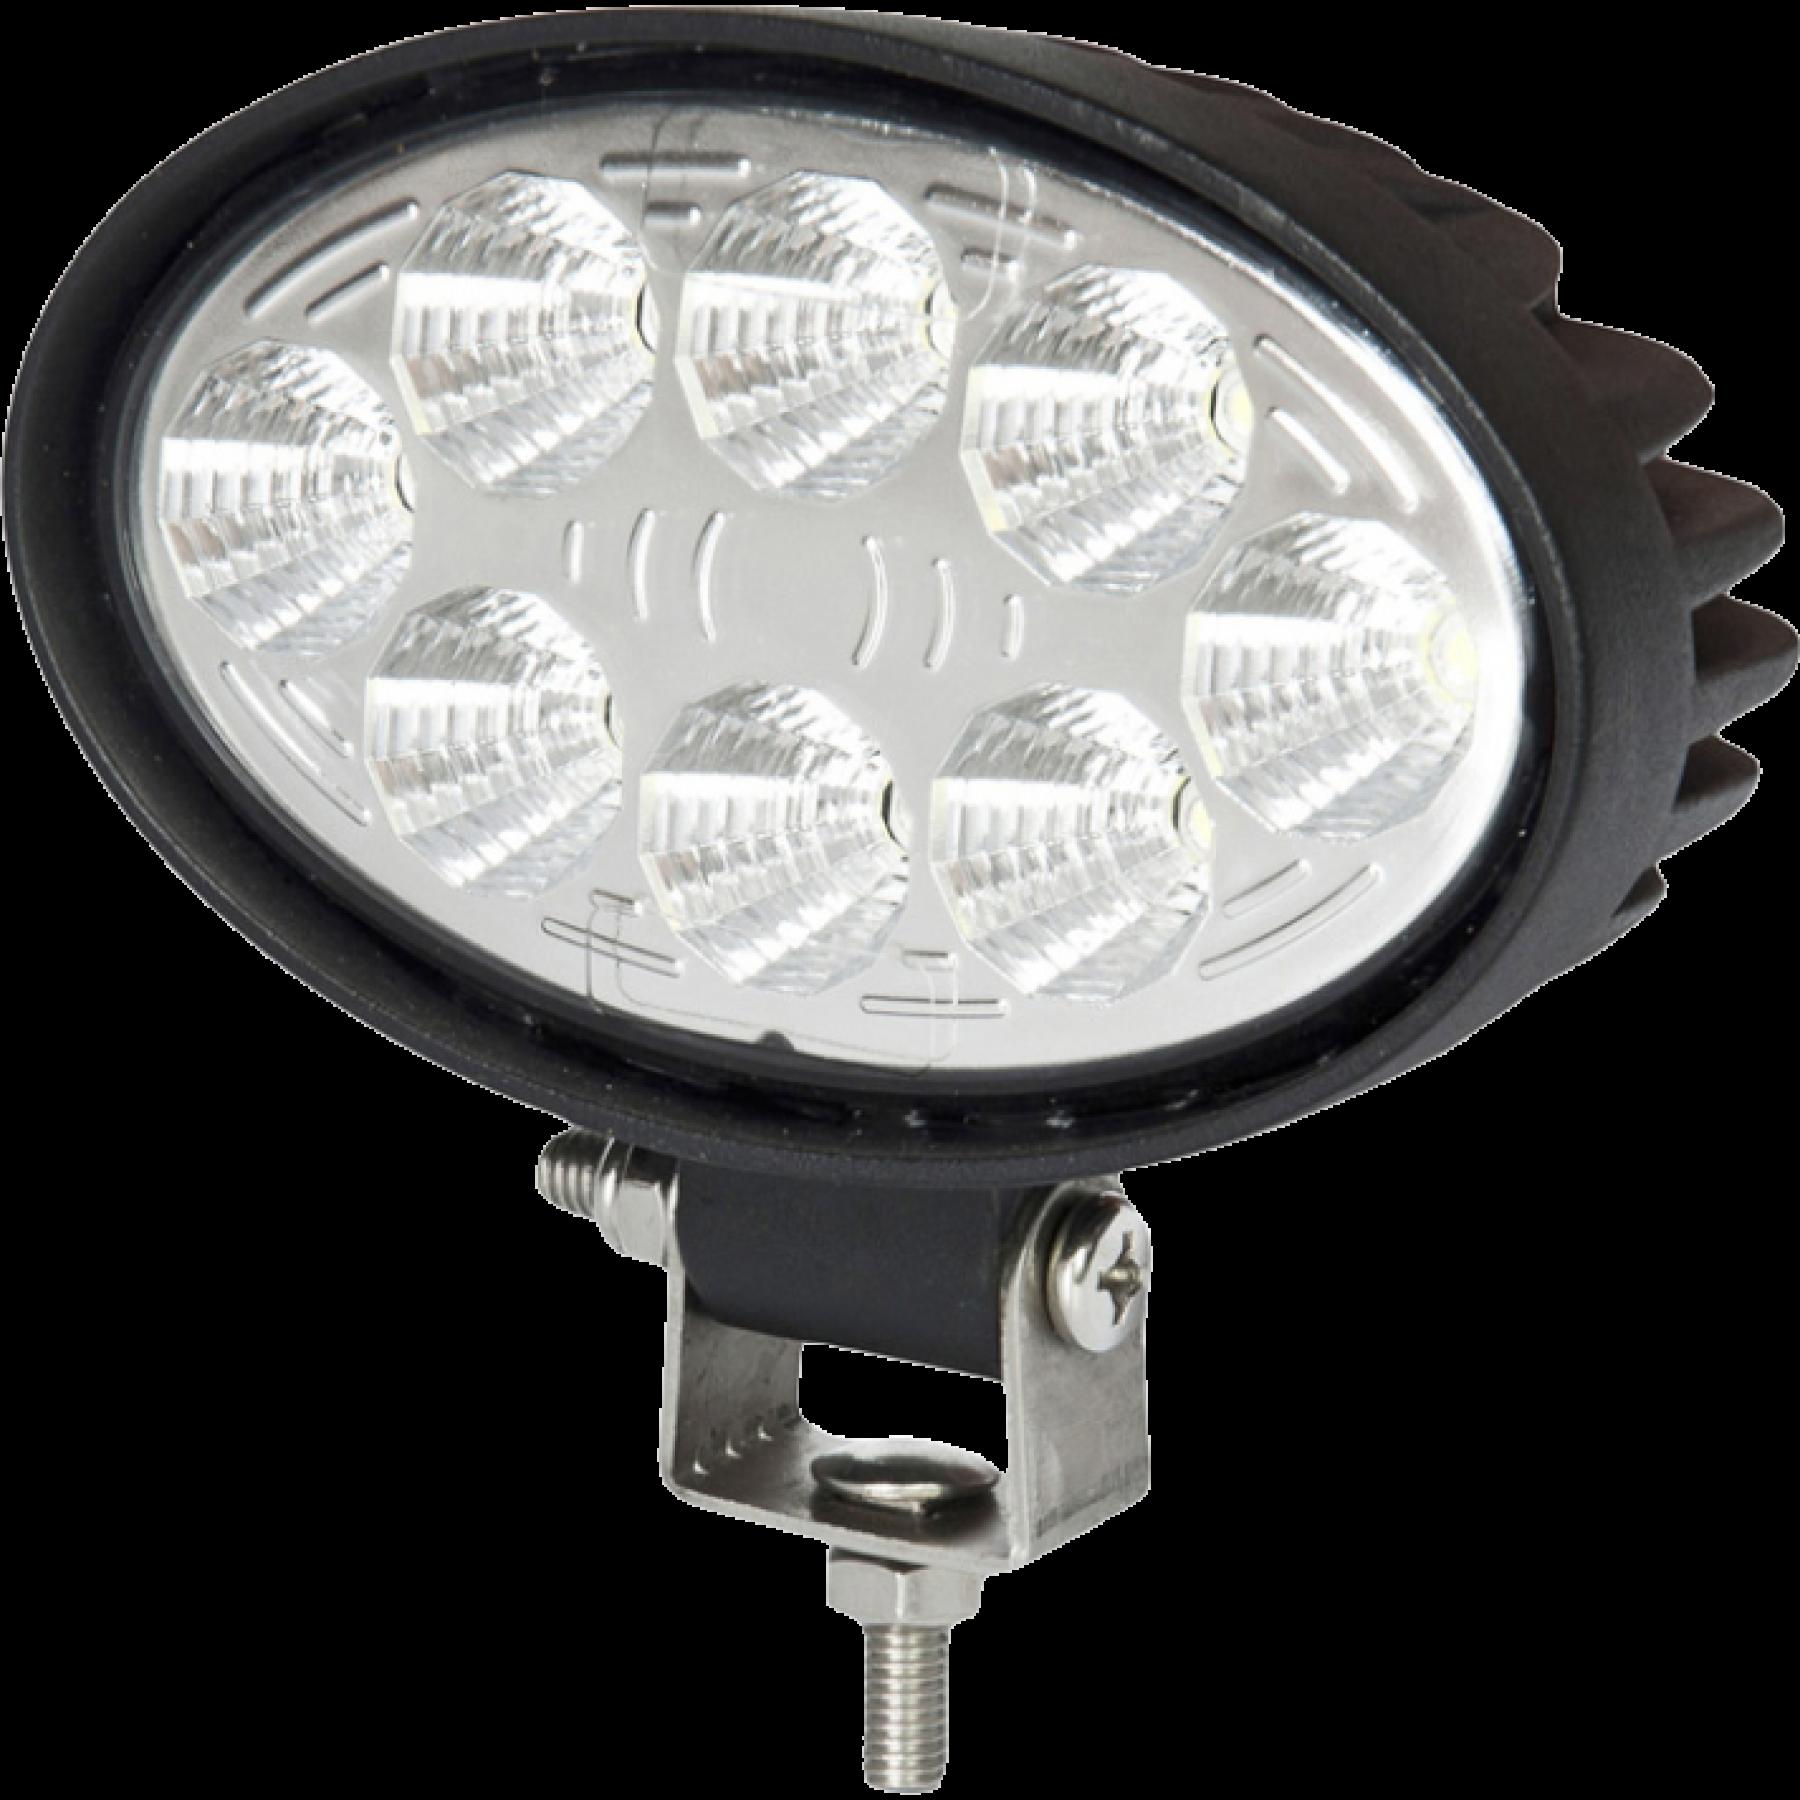 LED werklamp ovaal 24W 9-32v 2000 Lumen